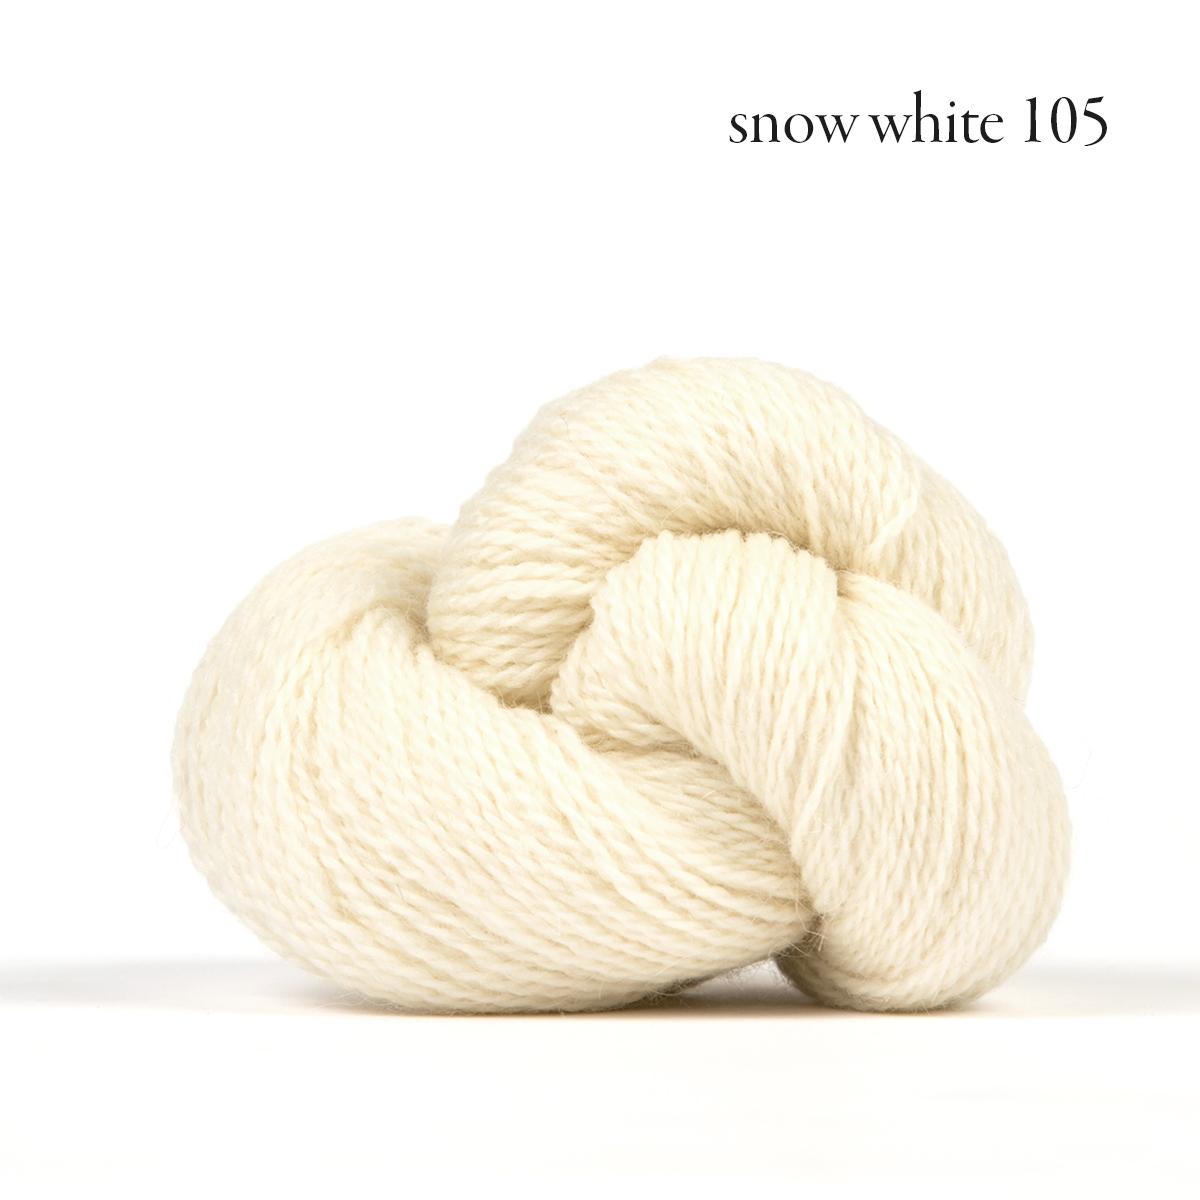 andorra snow white.jpg